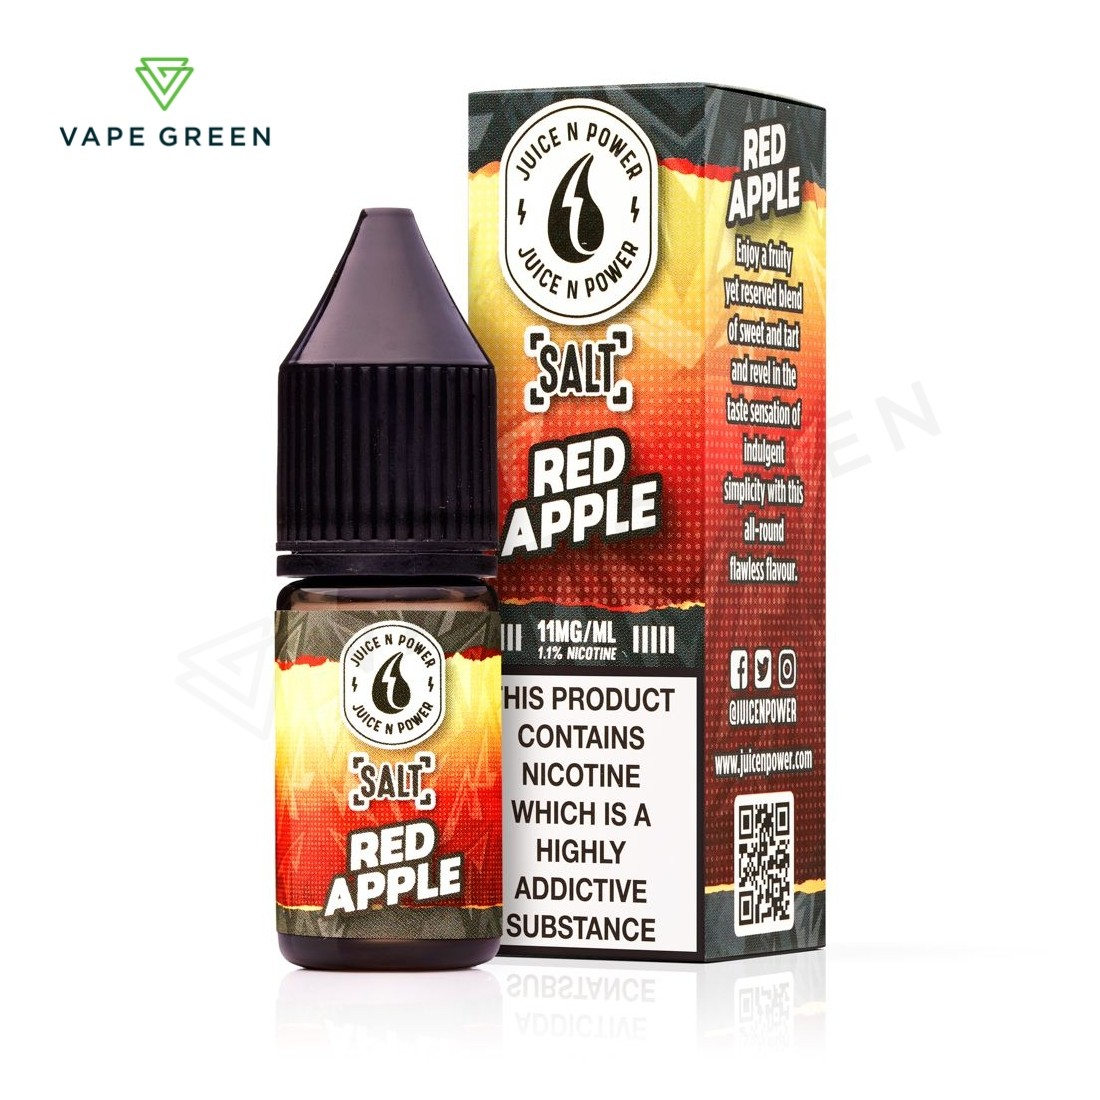 Red Apple E-Liquid by Juice N power Salt